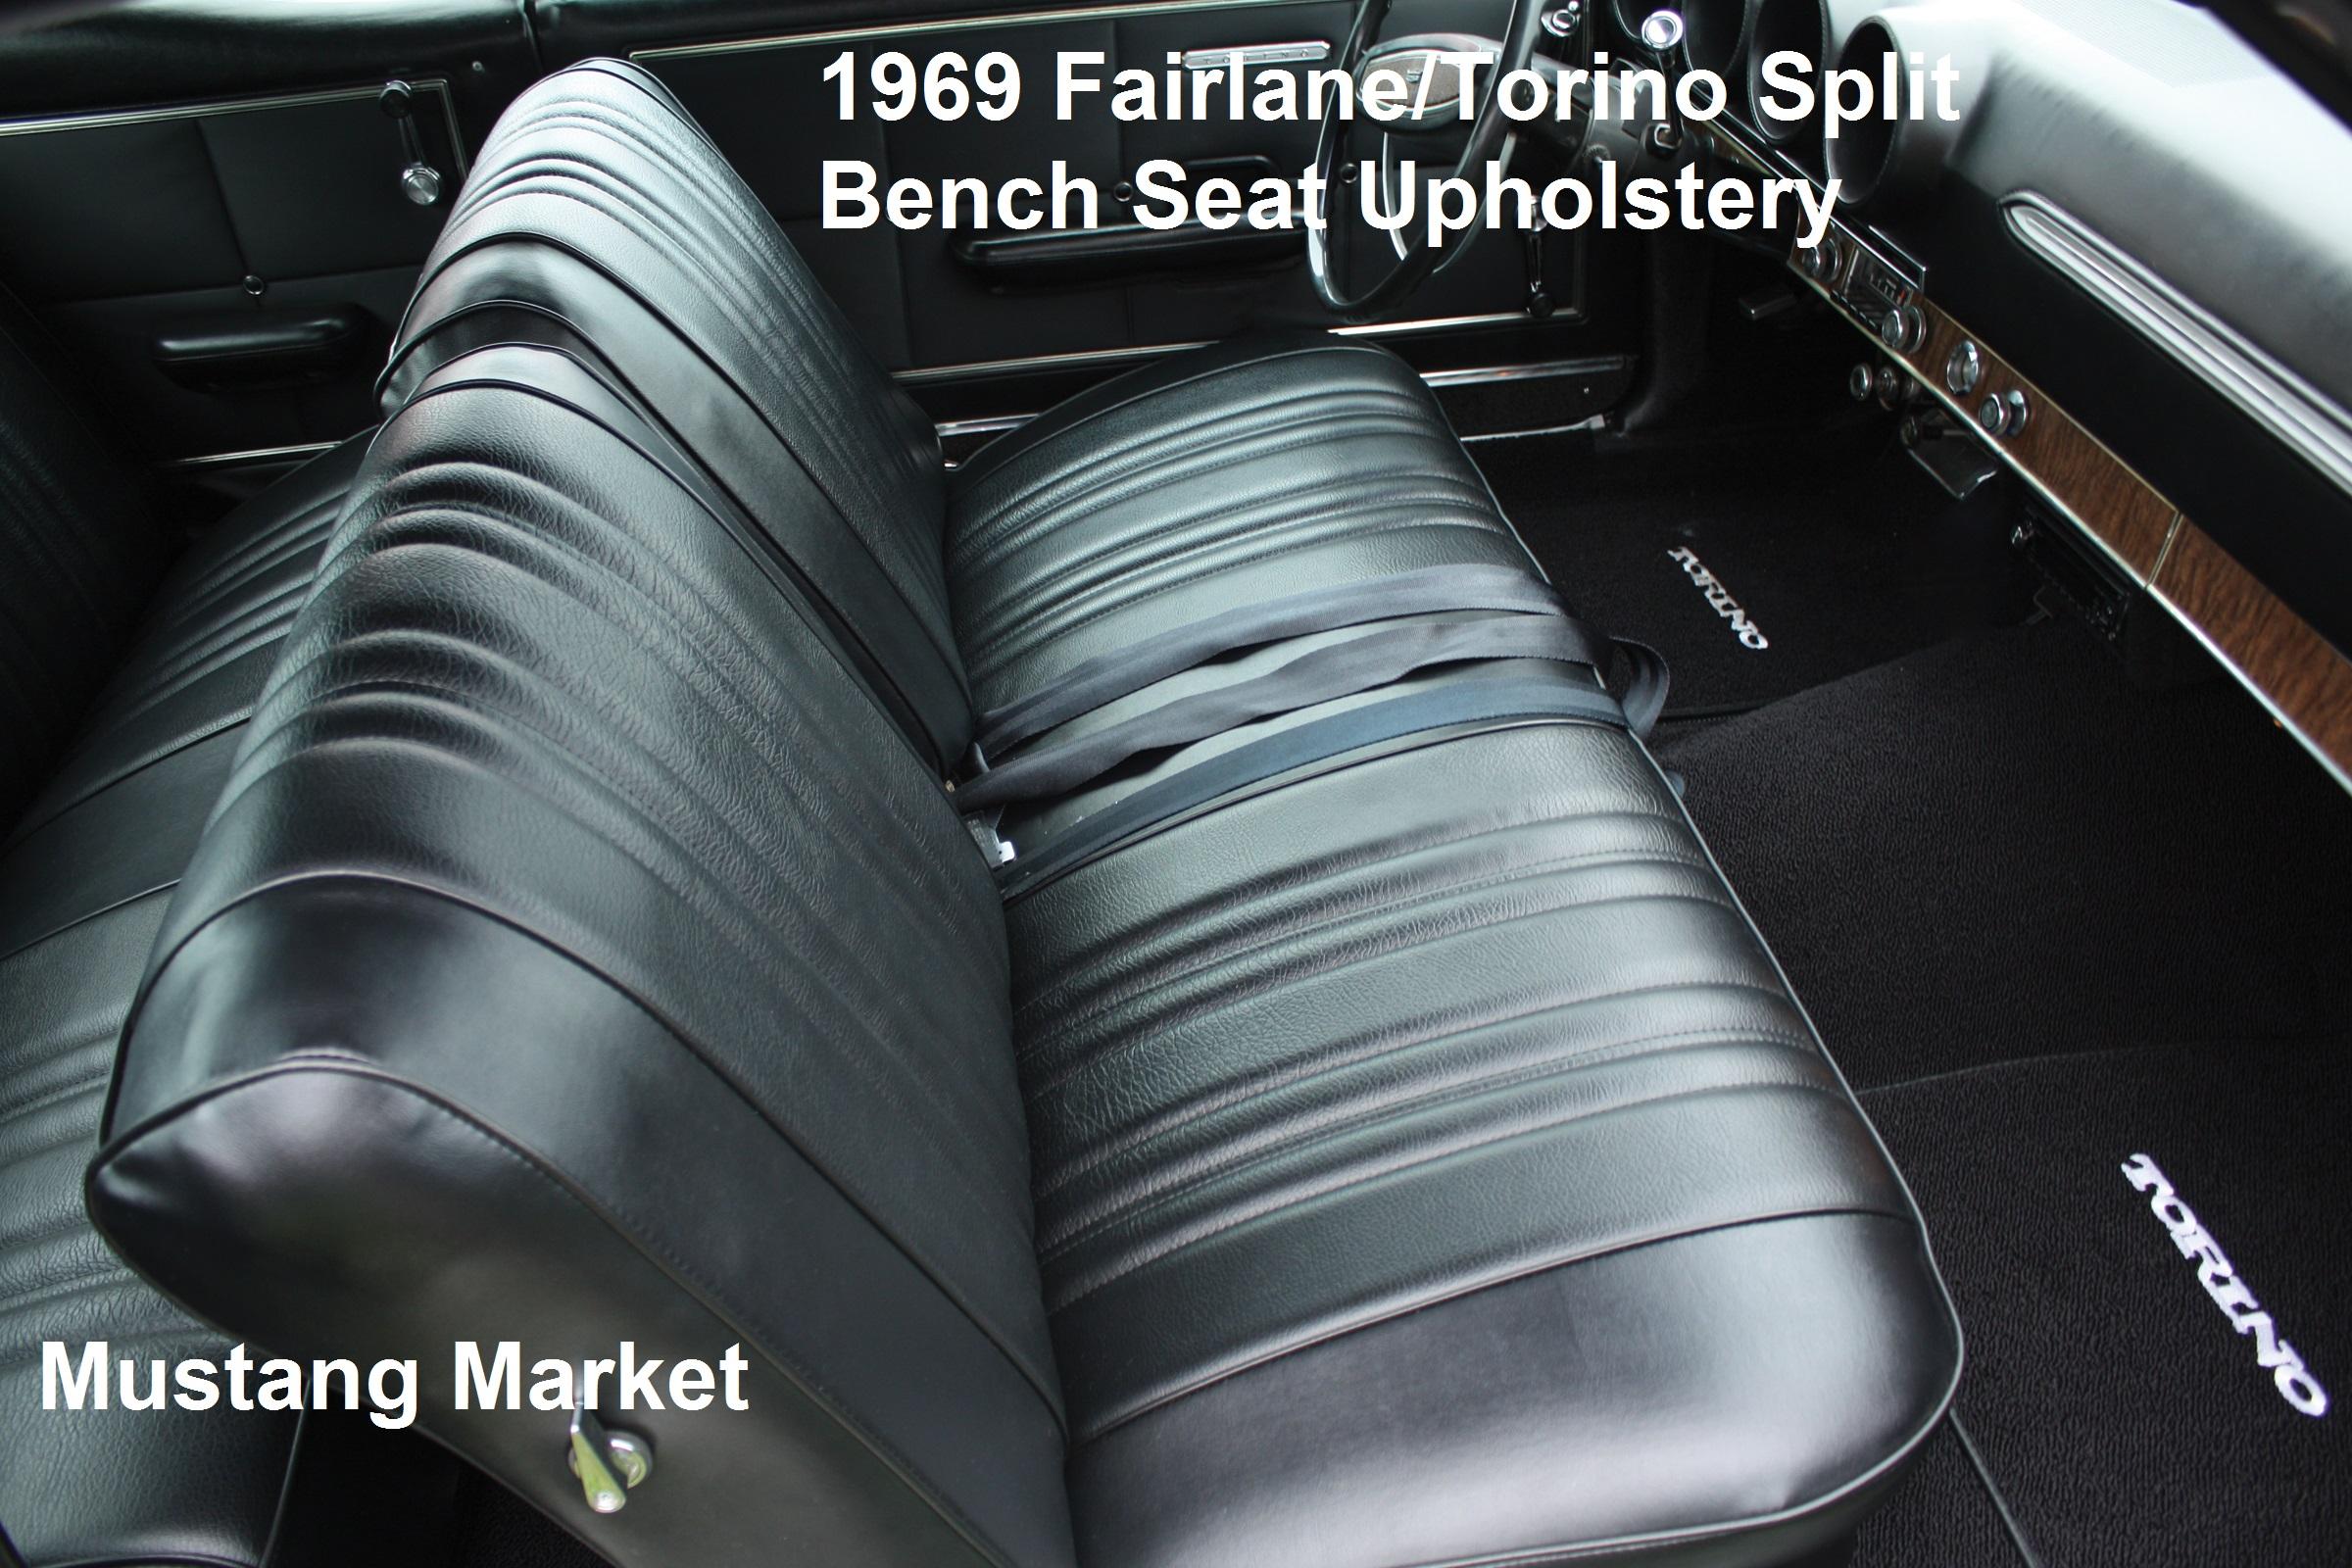 1969 Fairlane Bench Seat Upholstery